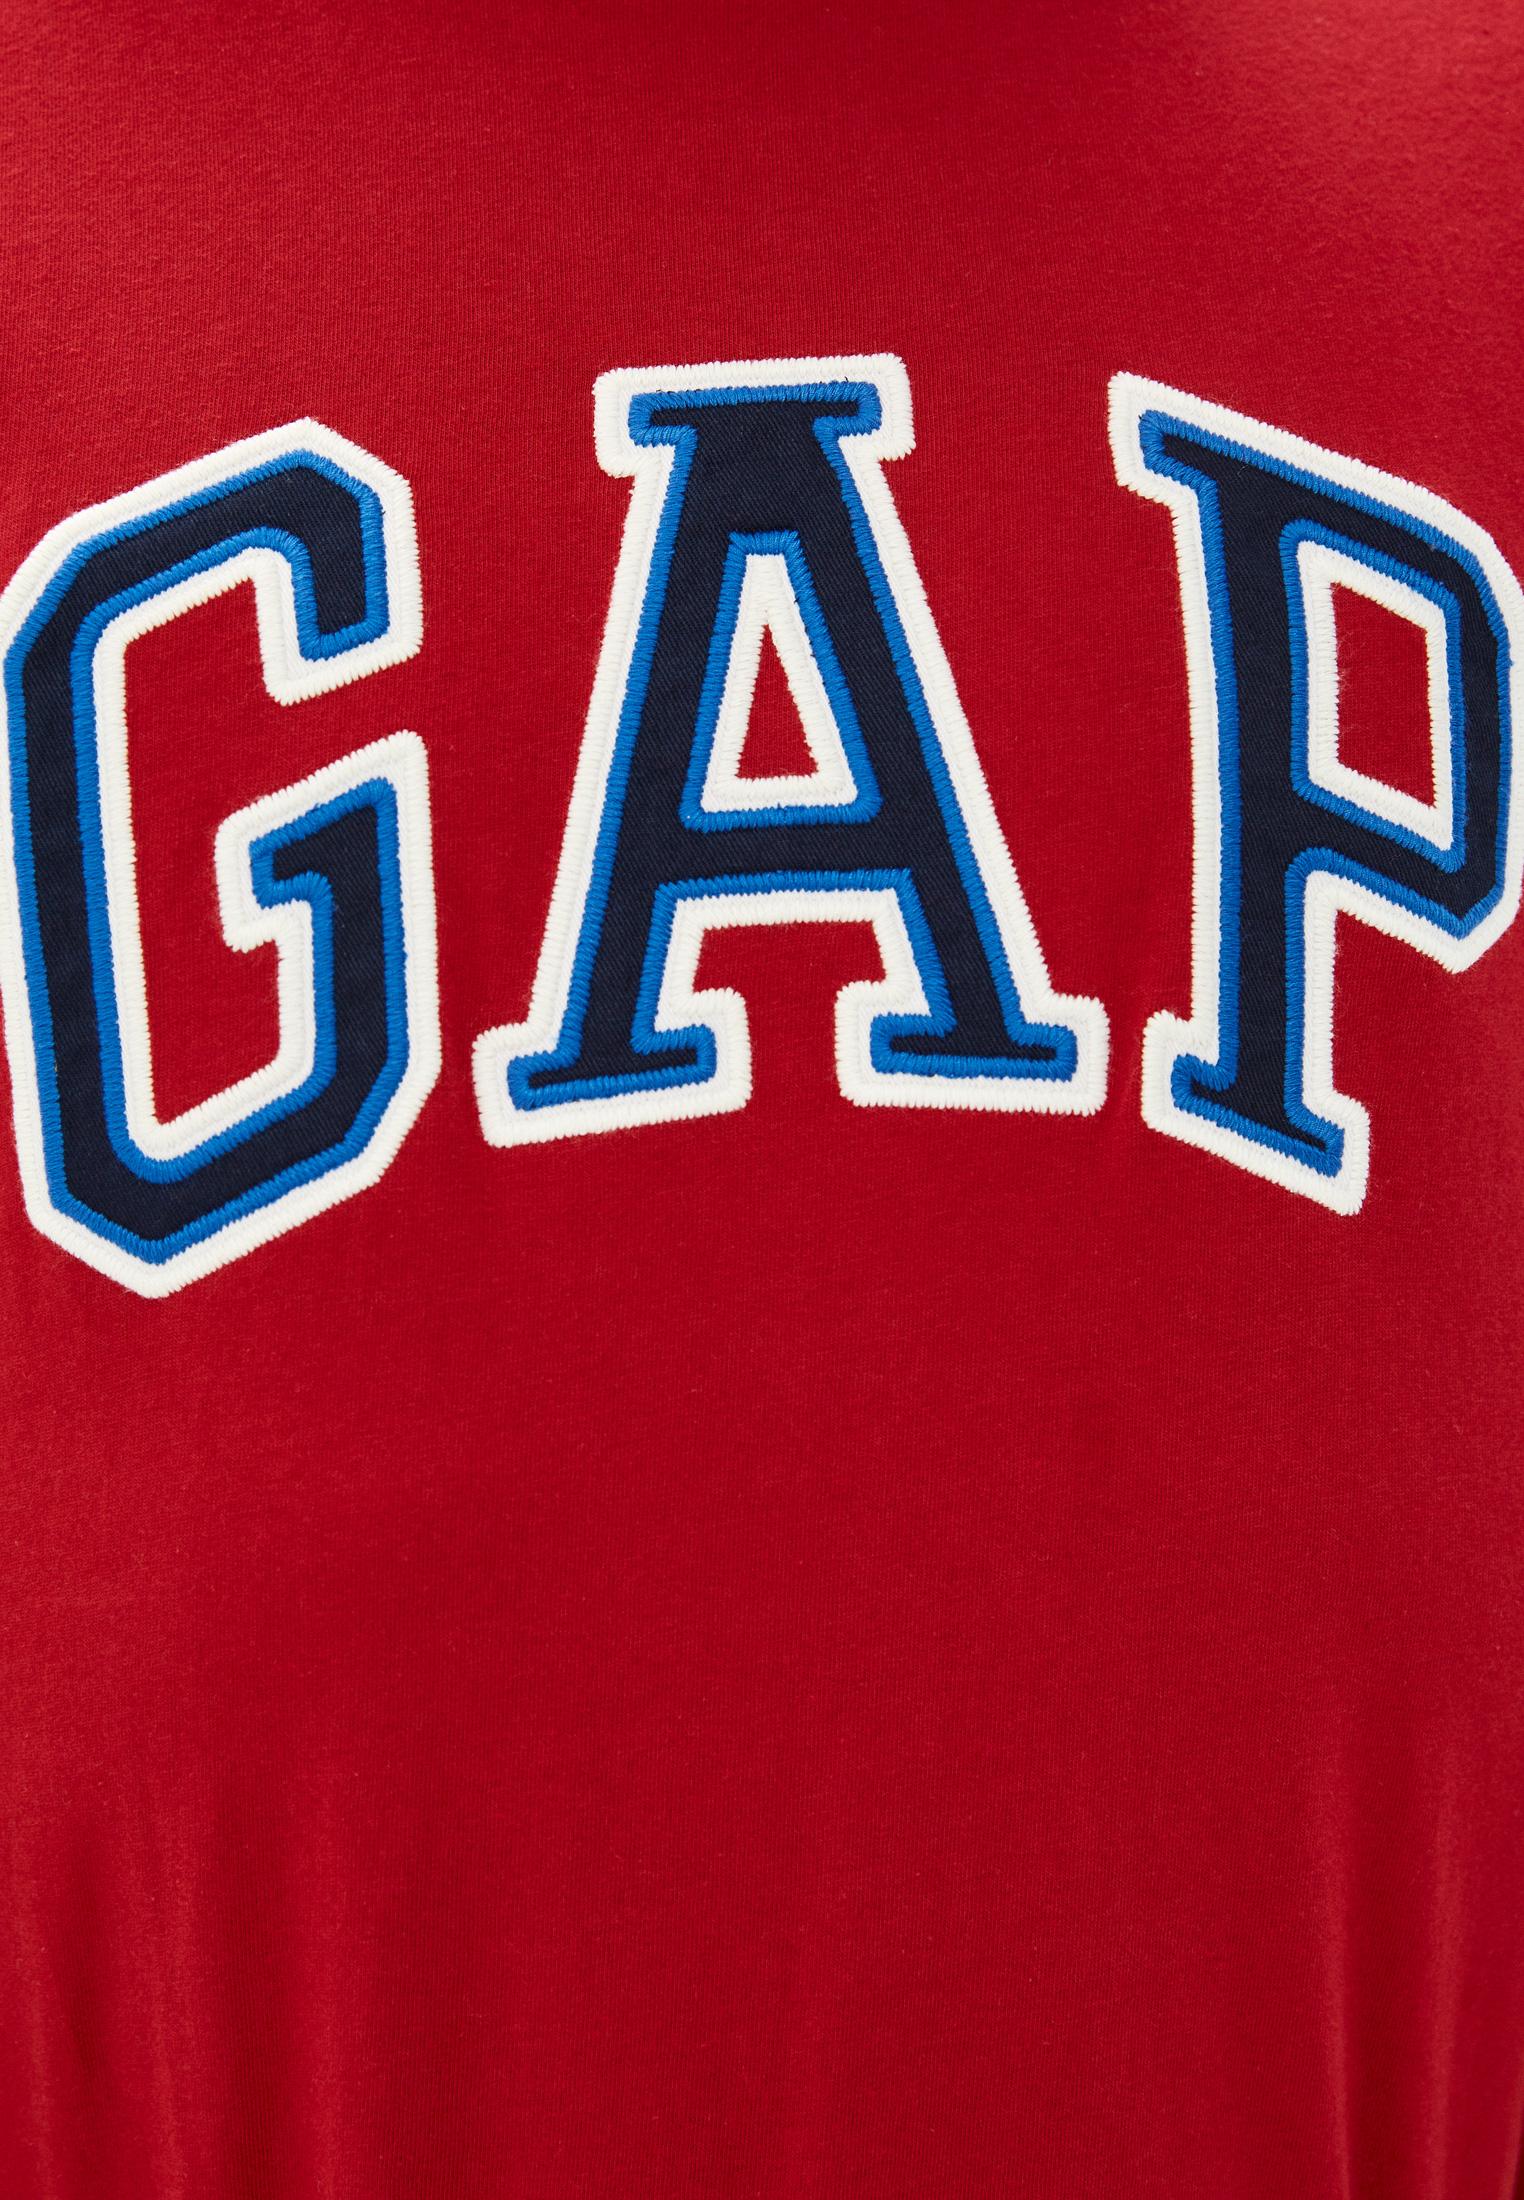 Футболка с коротким рукавом Gap 513858: изображение 3